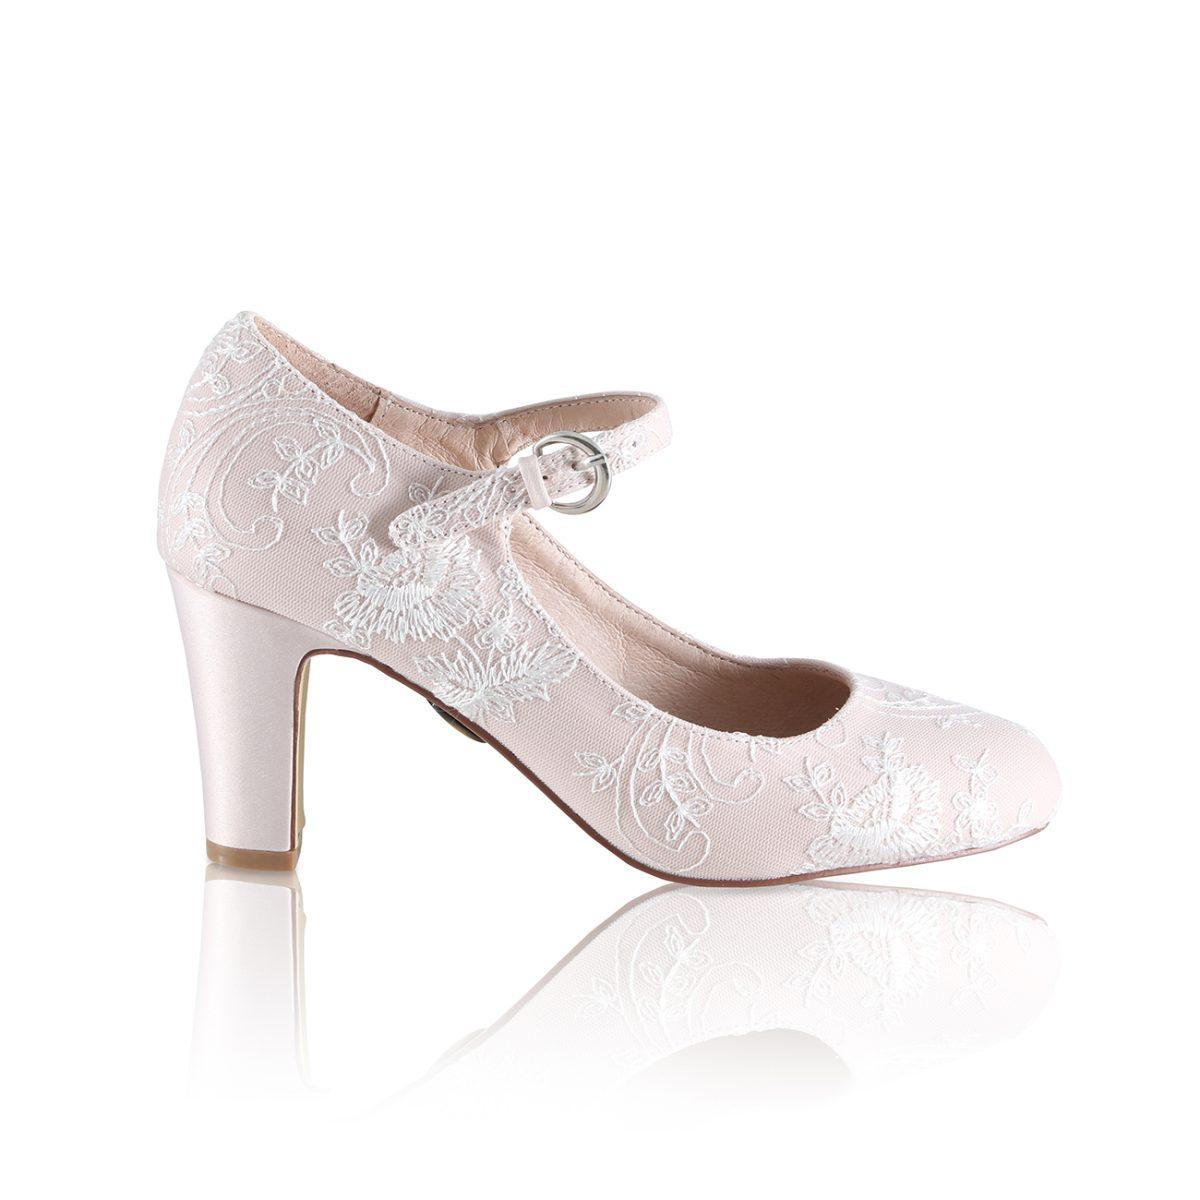 Perfect Bridal Martha Shoes - Blush